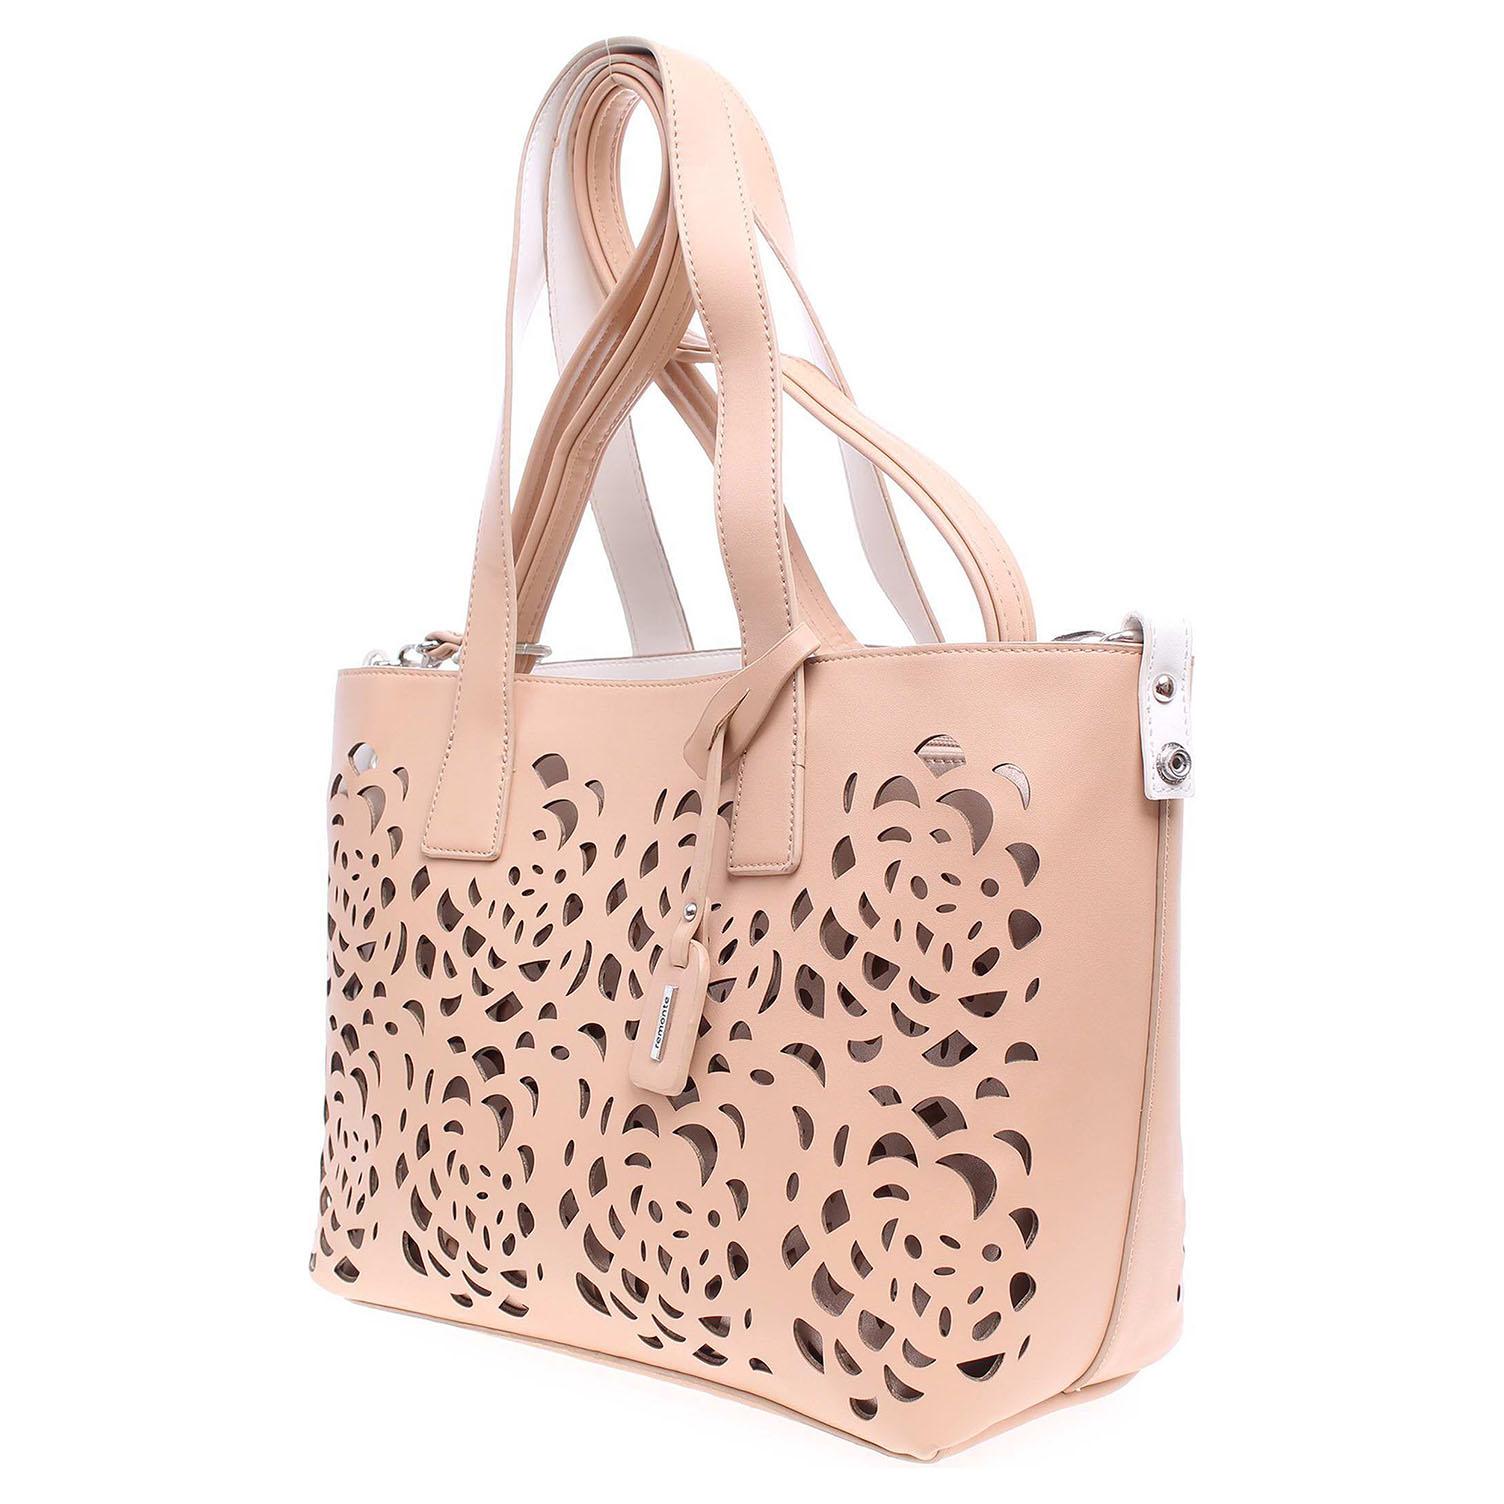 Ecco Remonte dámská kabelka Q0378-31 béžová 11891128